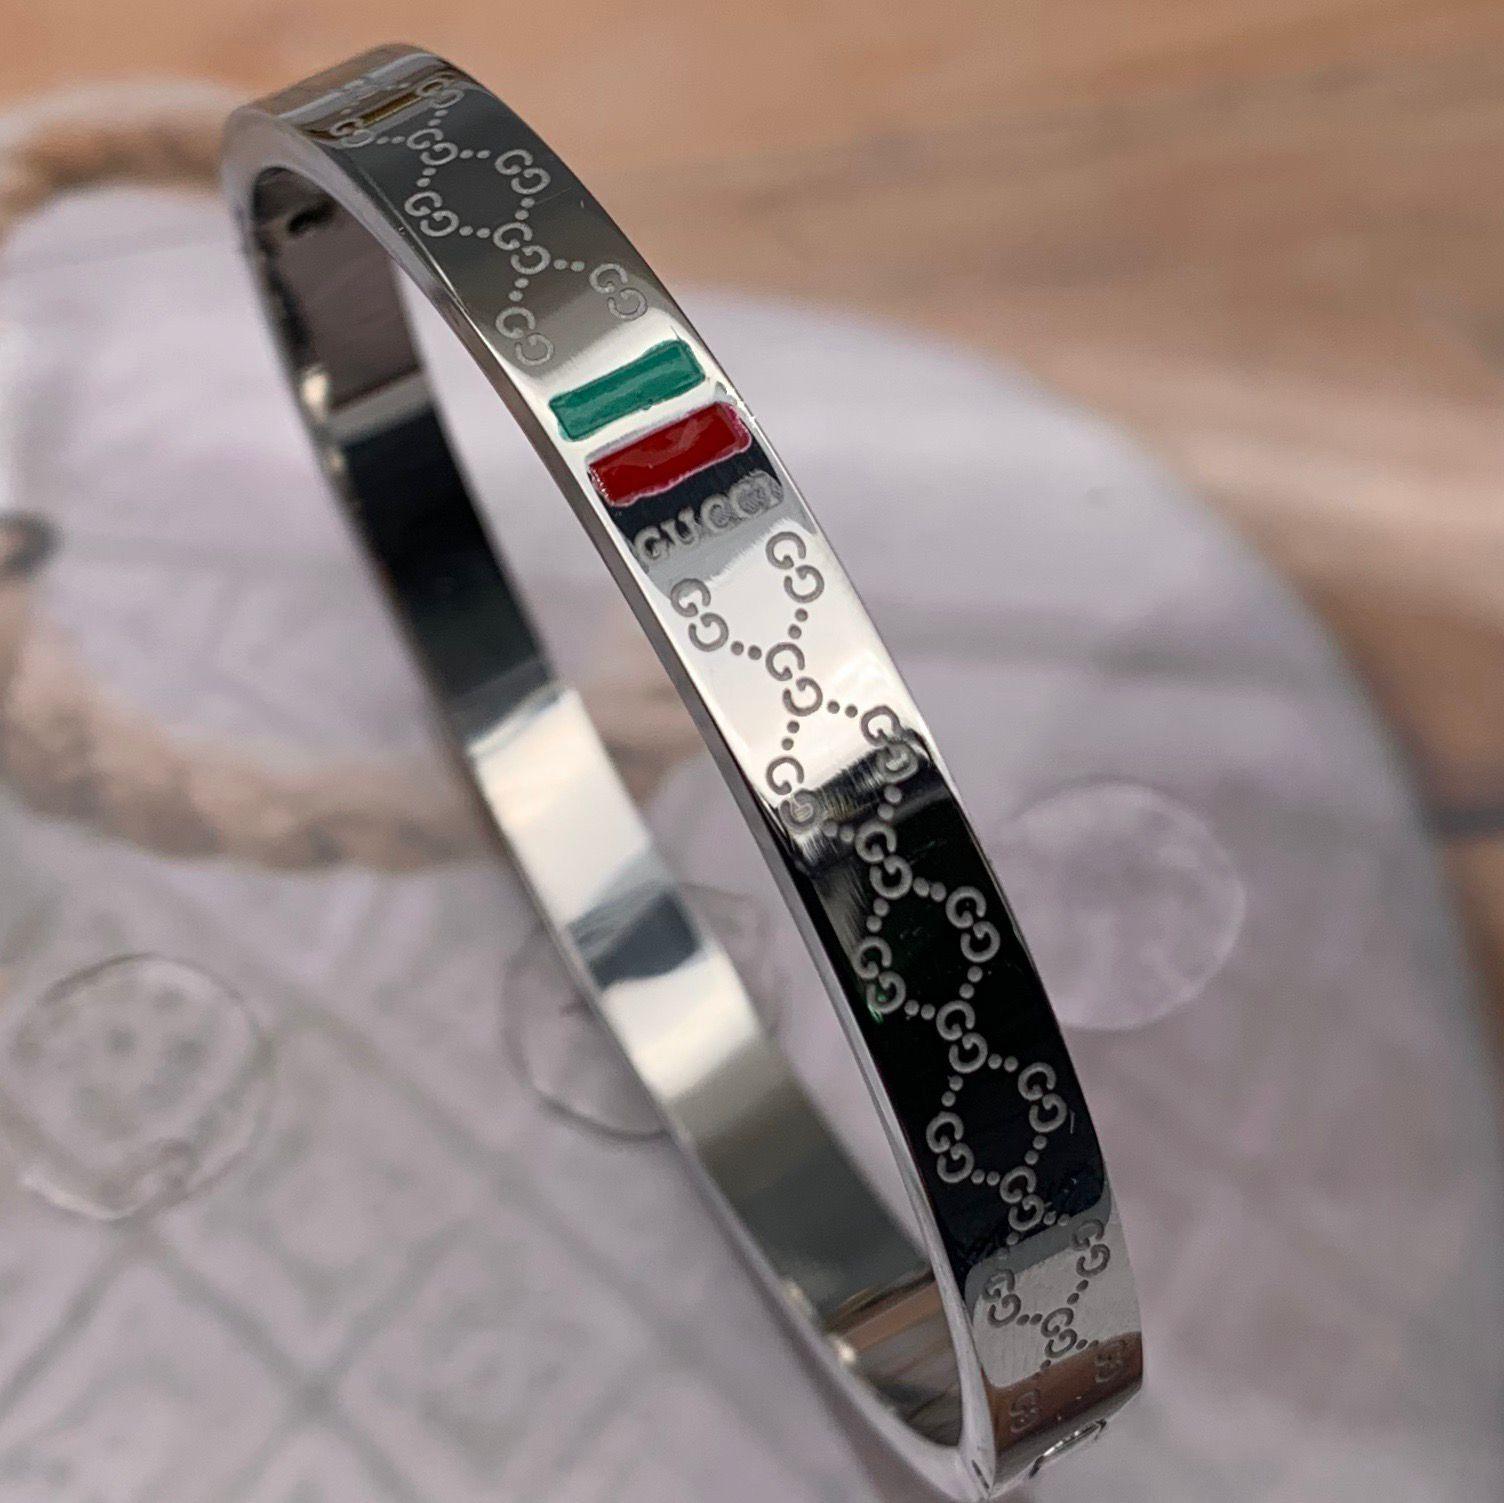 24 Ringe Modeschmuck wie Jelly Bracelets Gummi Glitzer metallic 6 Farben Trend